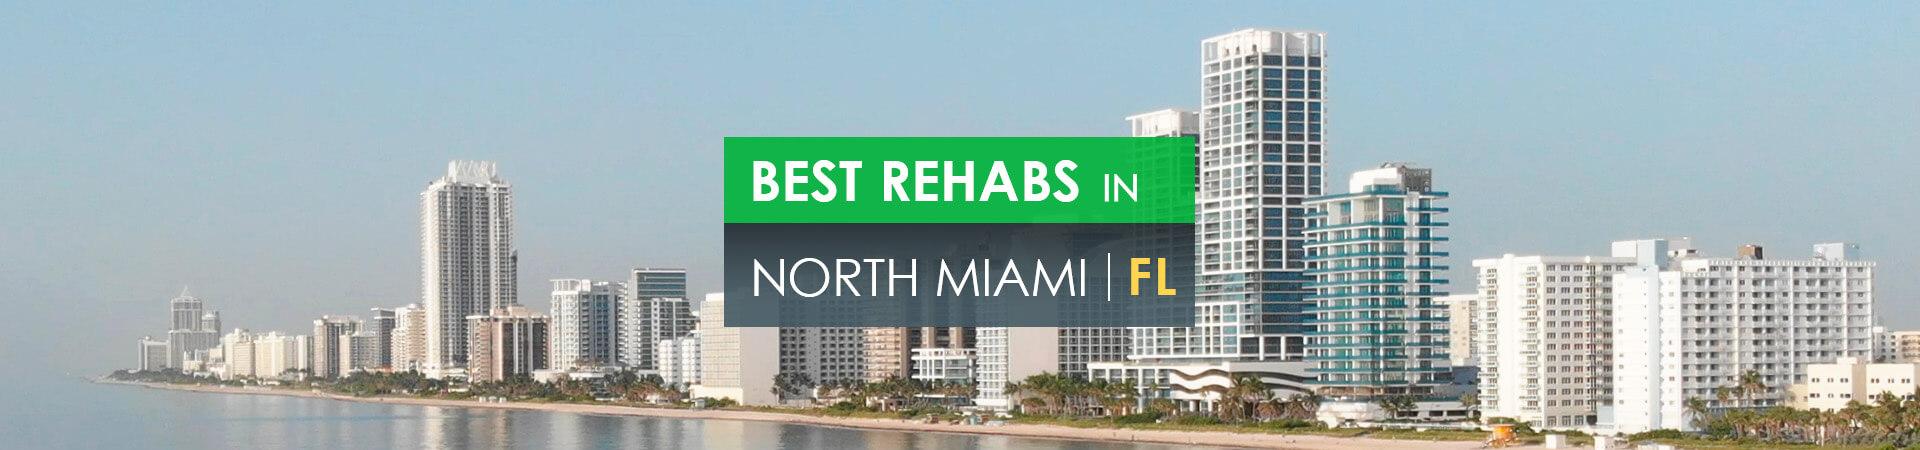 Best rehabs in North Miami, FL